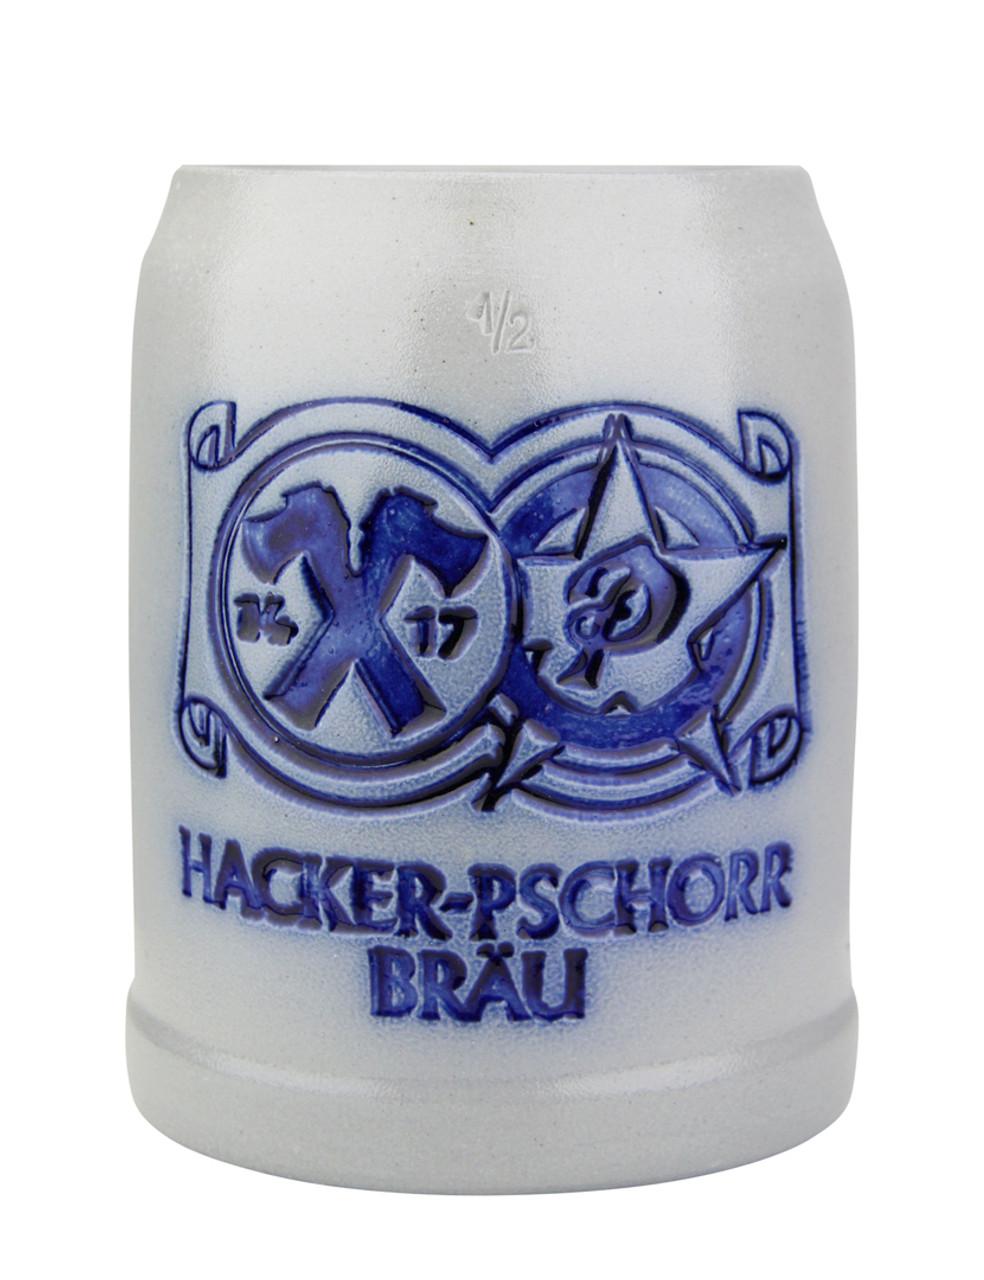 Hacker Pschorr Brewery 0.5 Liter Salt Glaze Stoneware Beer Mug